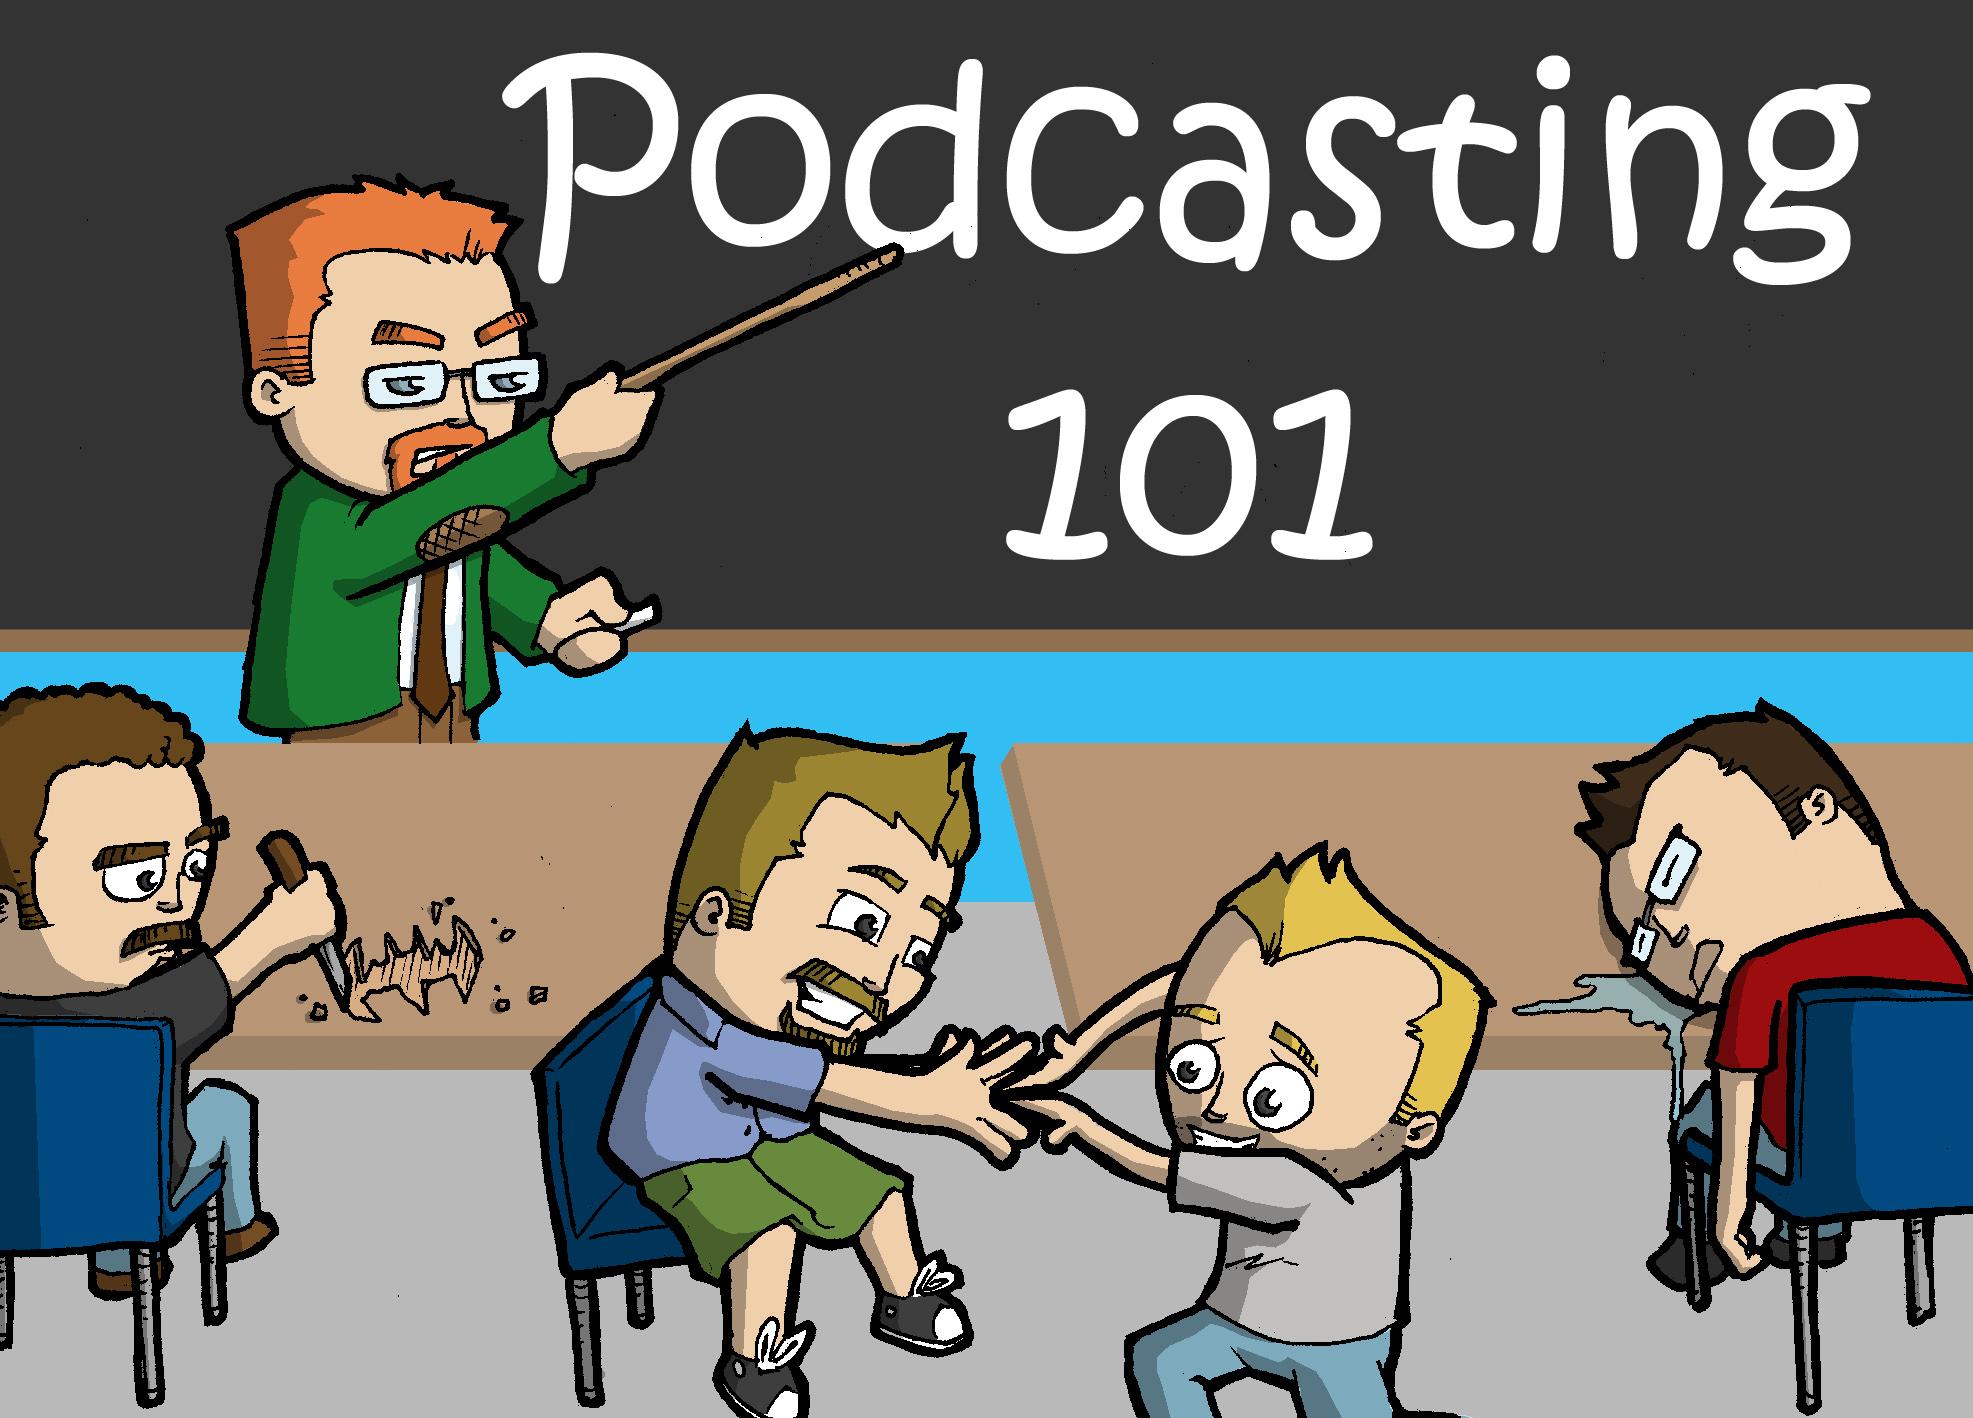 Podcasting 101 / Social Media / Marketing / Content Marketing / Twitter / Blogging / Tumblr / Facebook / LinkedIn / Google+ / Inspire / Teach / Writing / Publishing